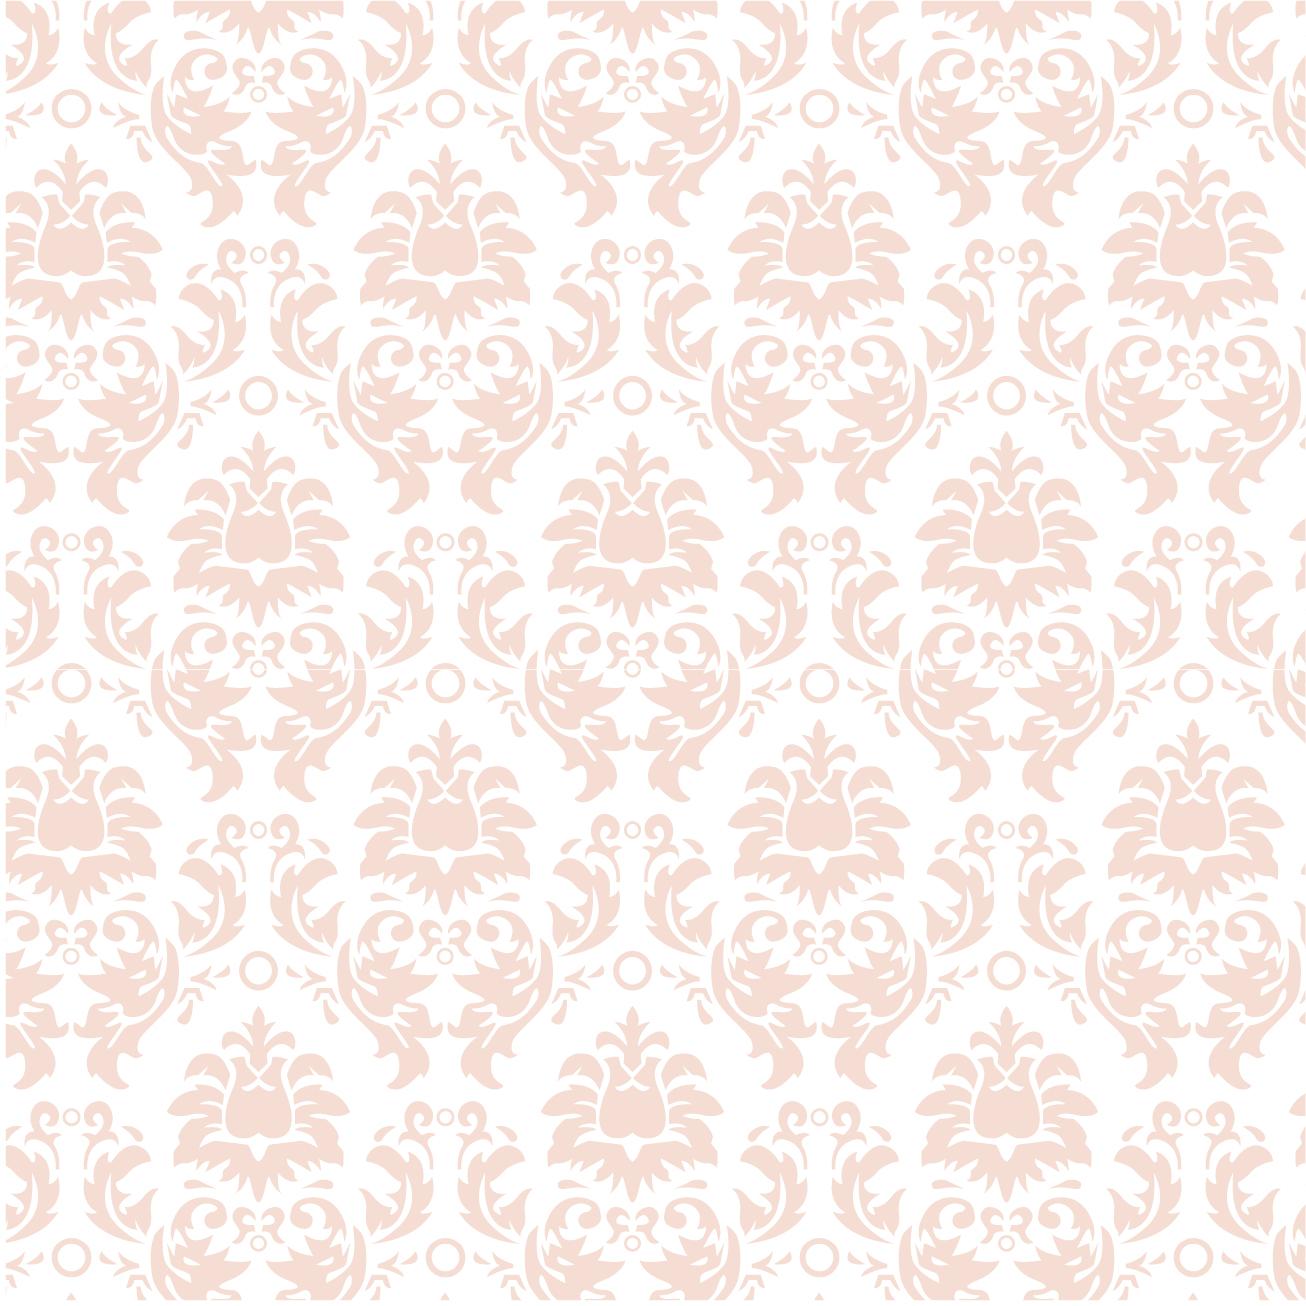 melos_logo_pattern-14.jpg